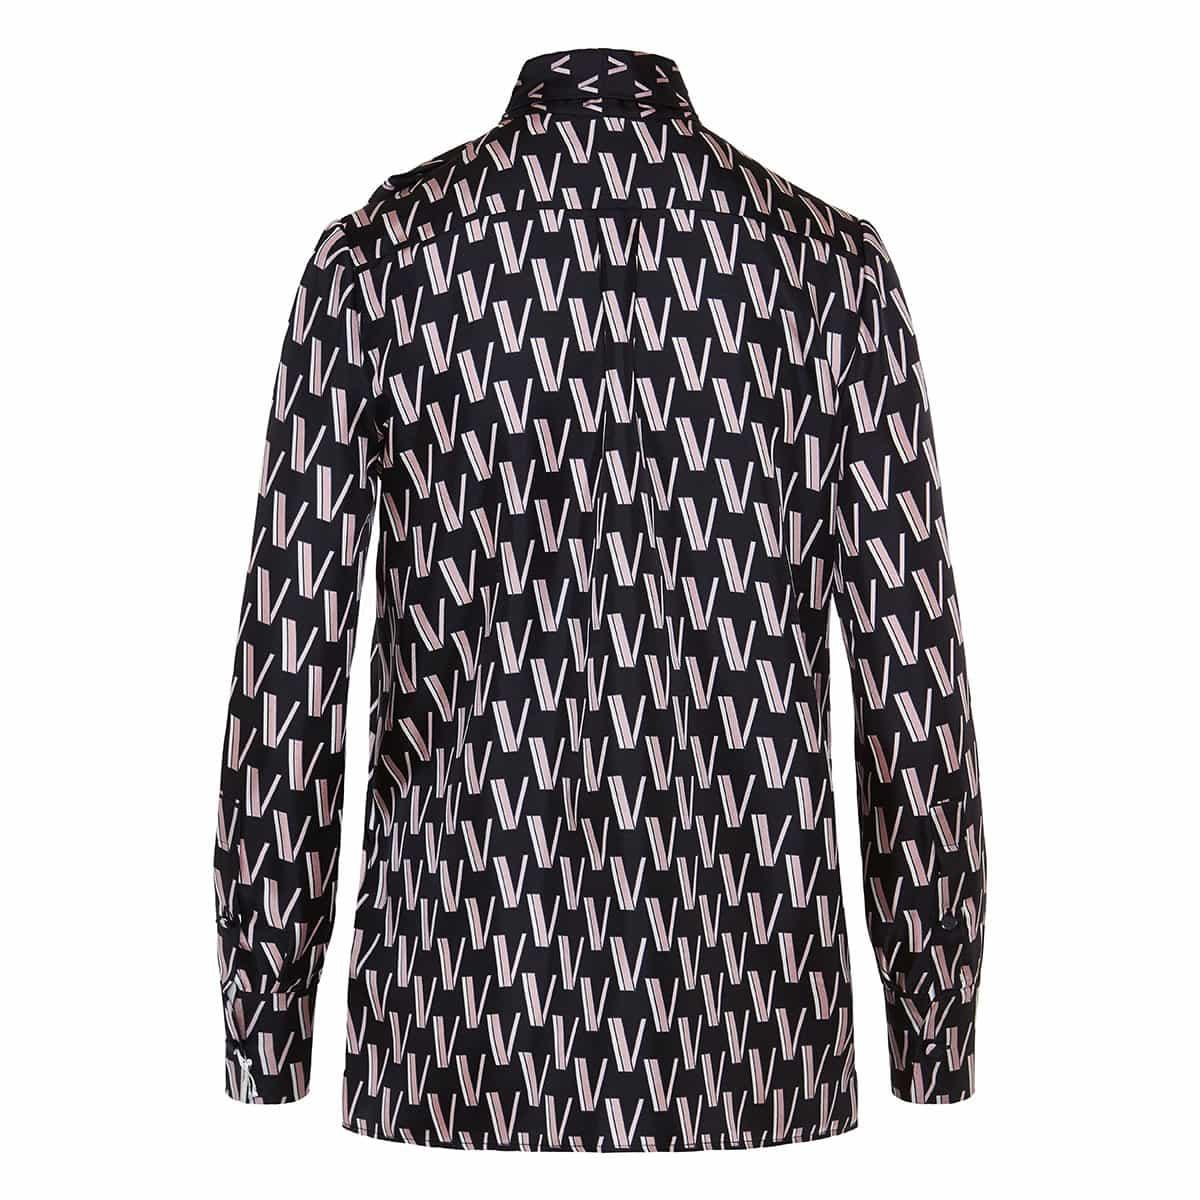 V-print bow-tie silk shirt